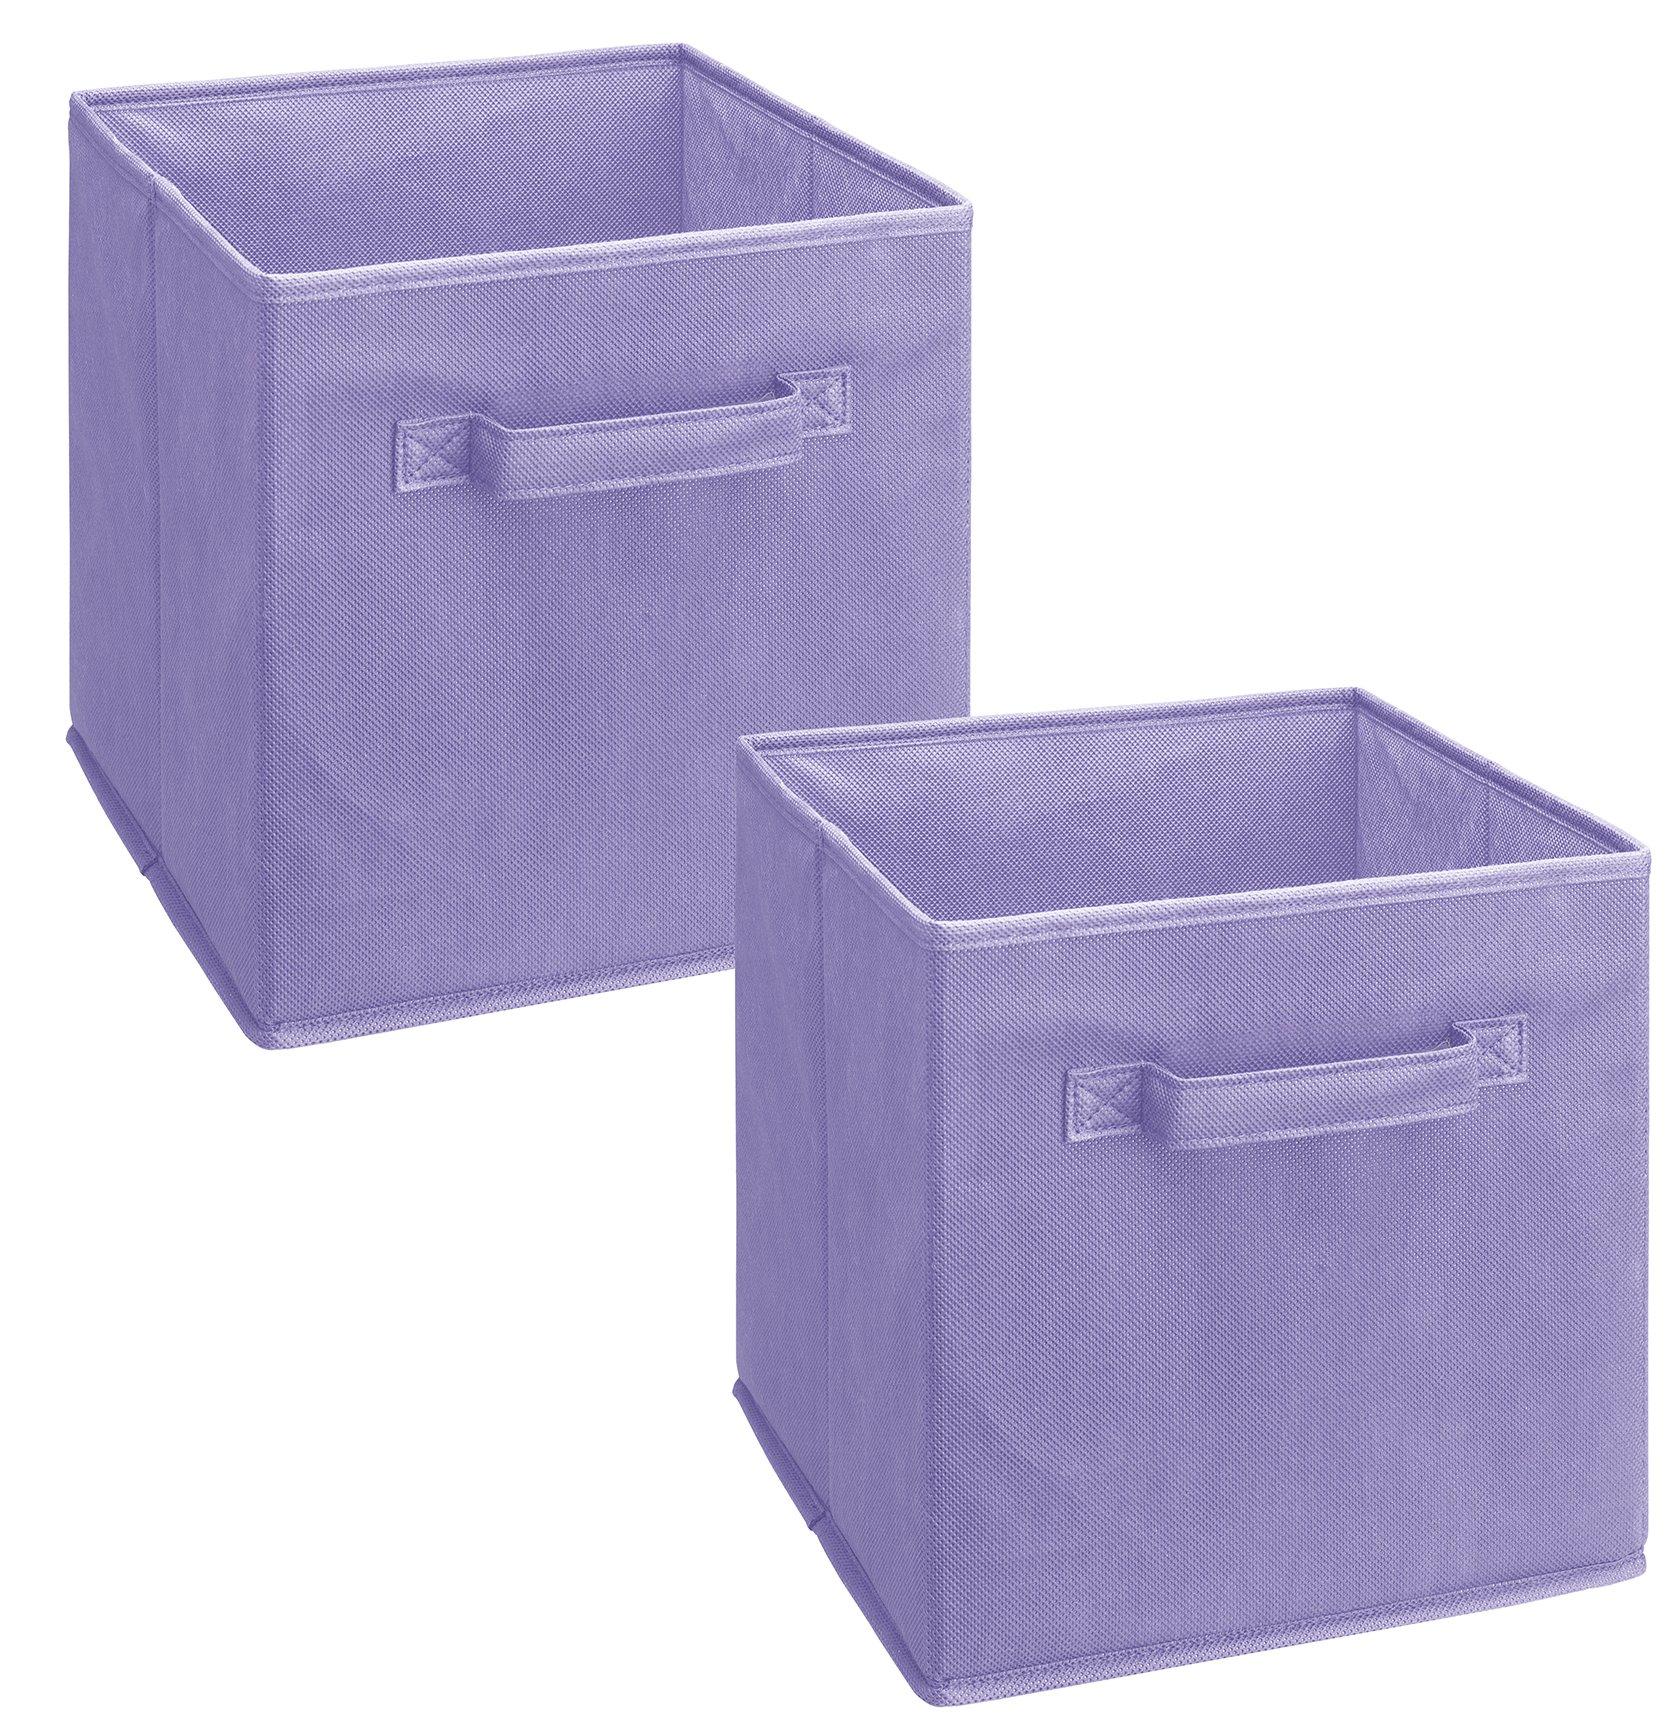 ClosetMaid 3878 Cubeicals Fabric Drawer, Light Purple, 2-Pack